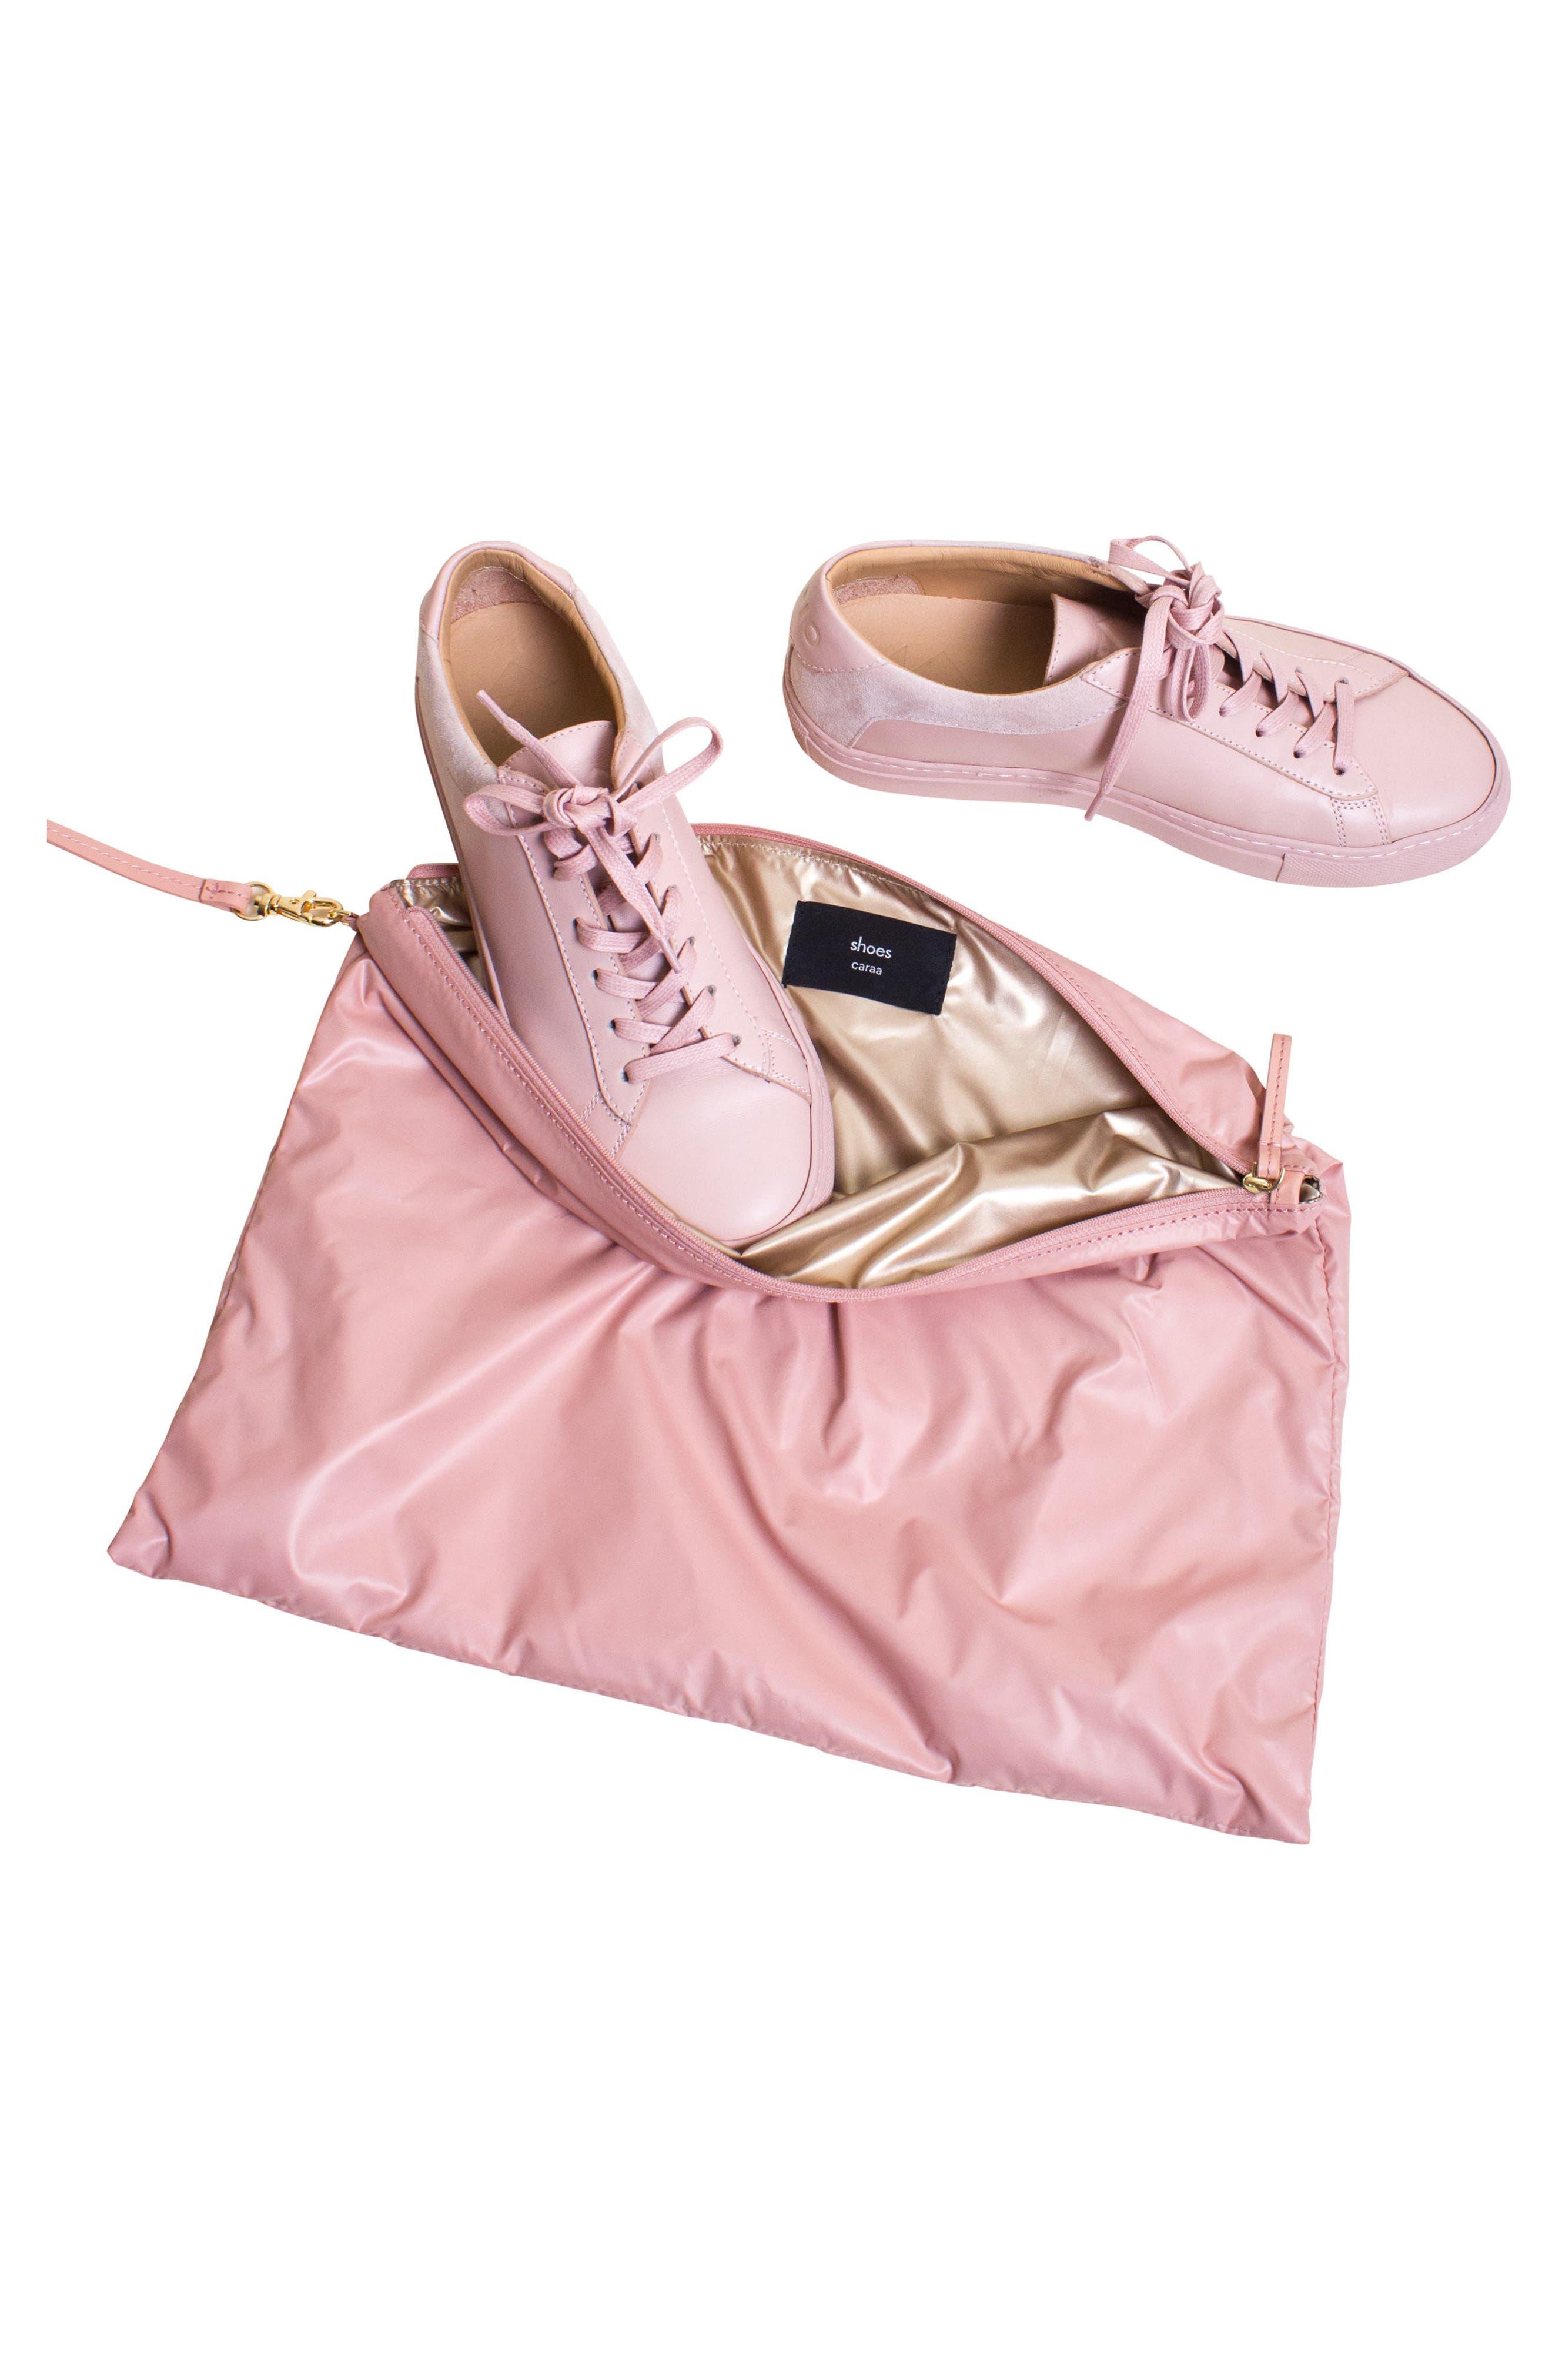 Stratus Waterproof Backpack,                             Alternate thumbnail 7, color,                             Pink